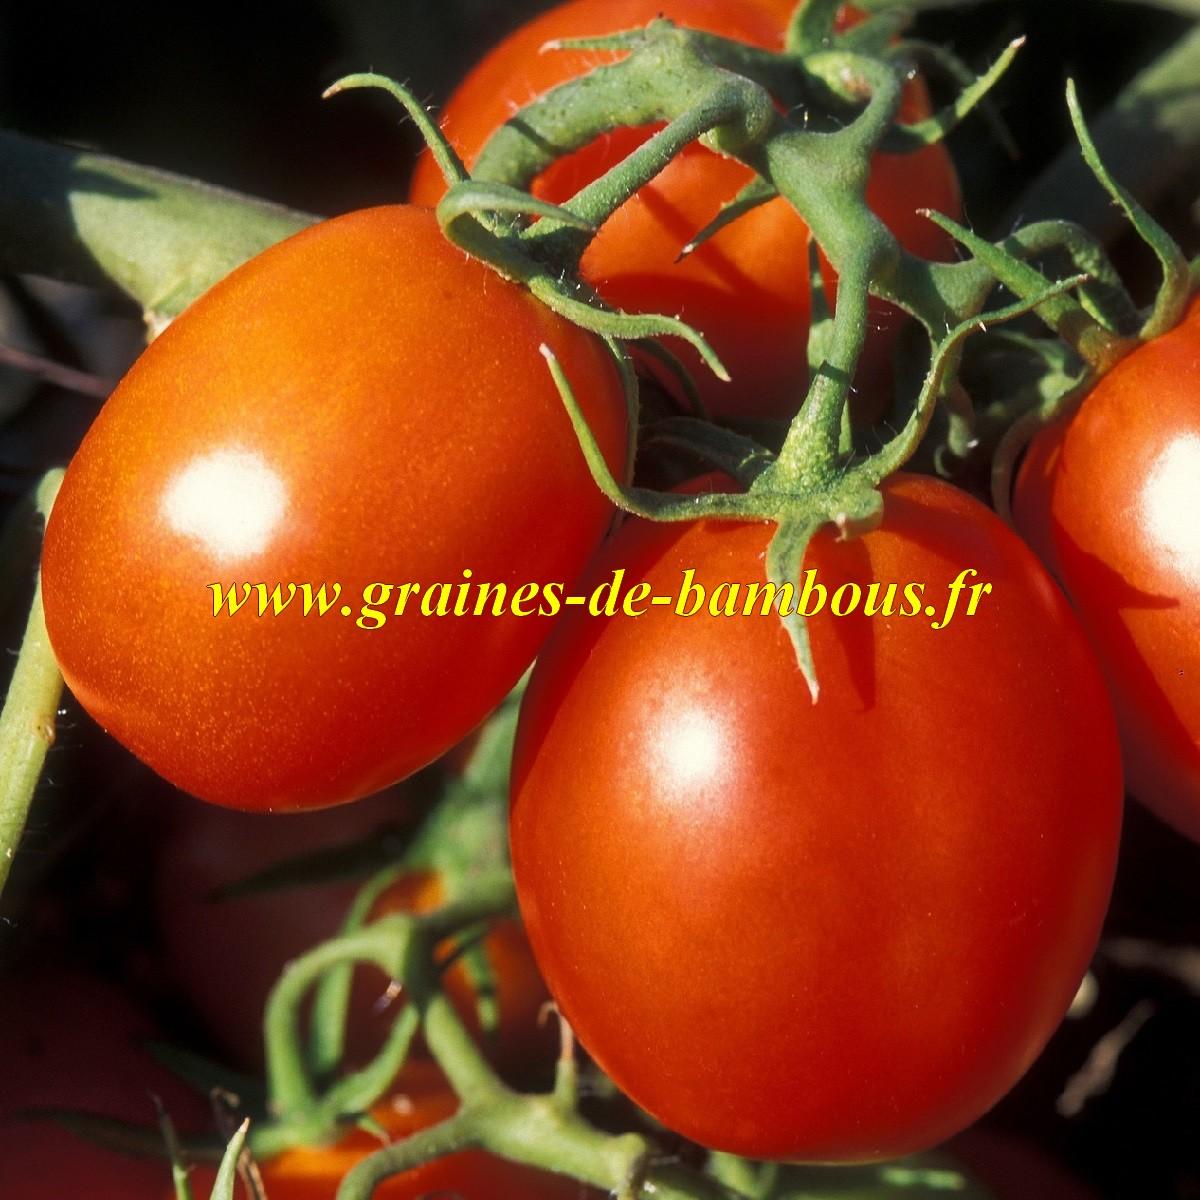 Tomate arbre de berao